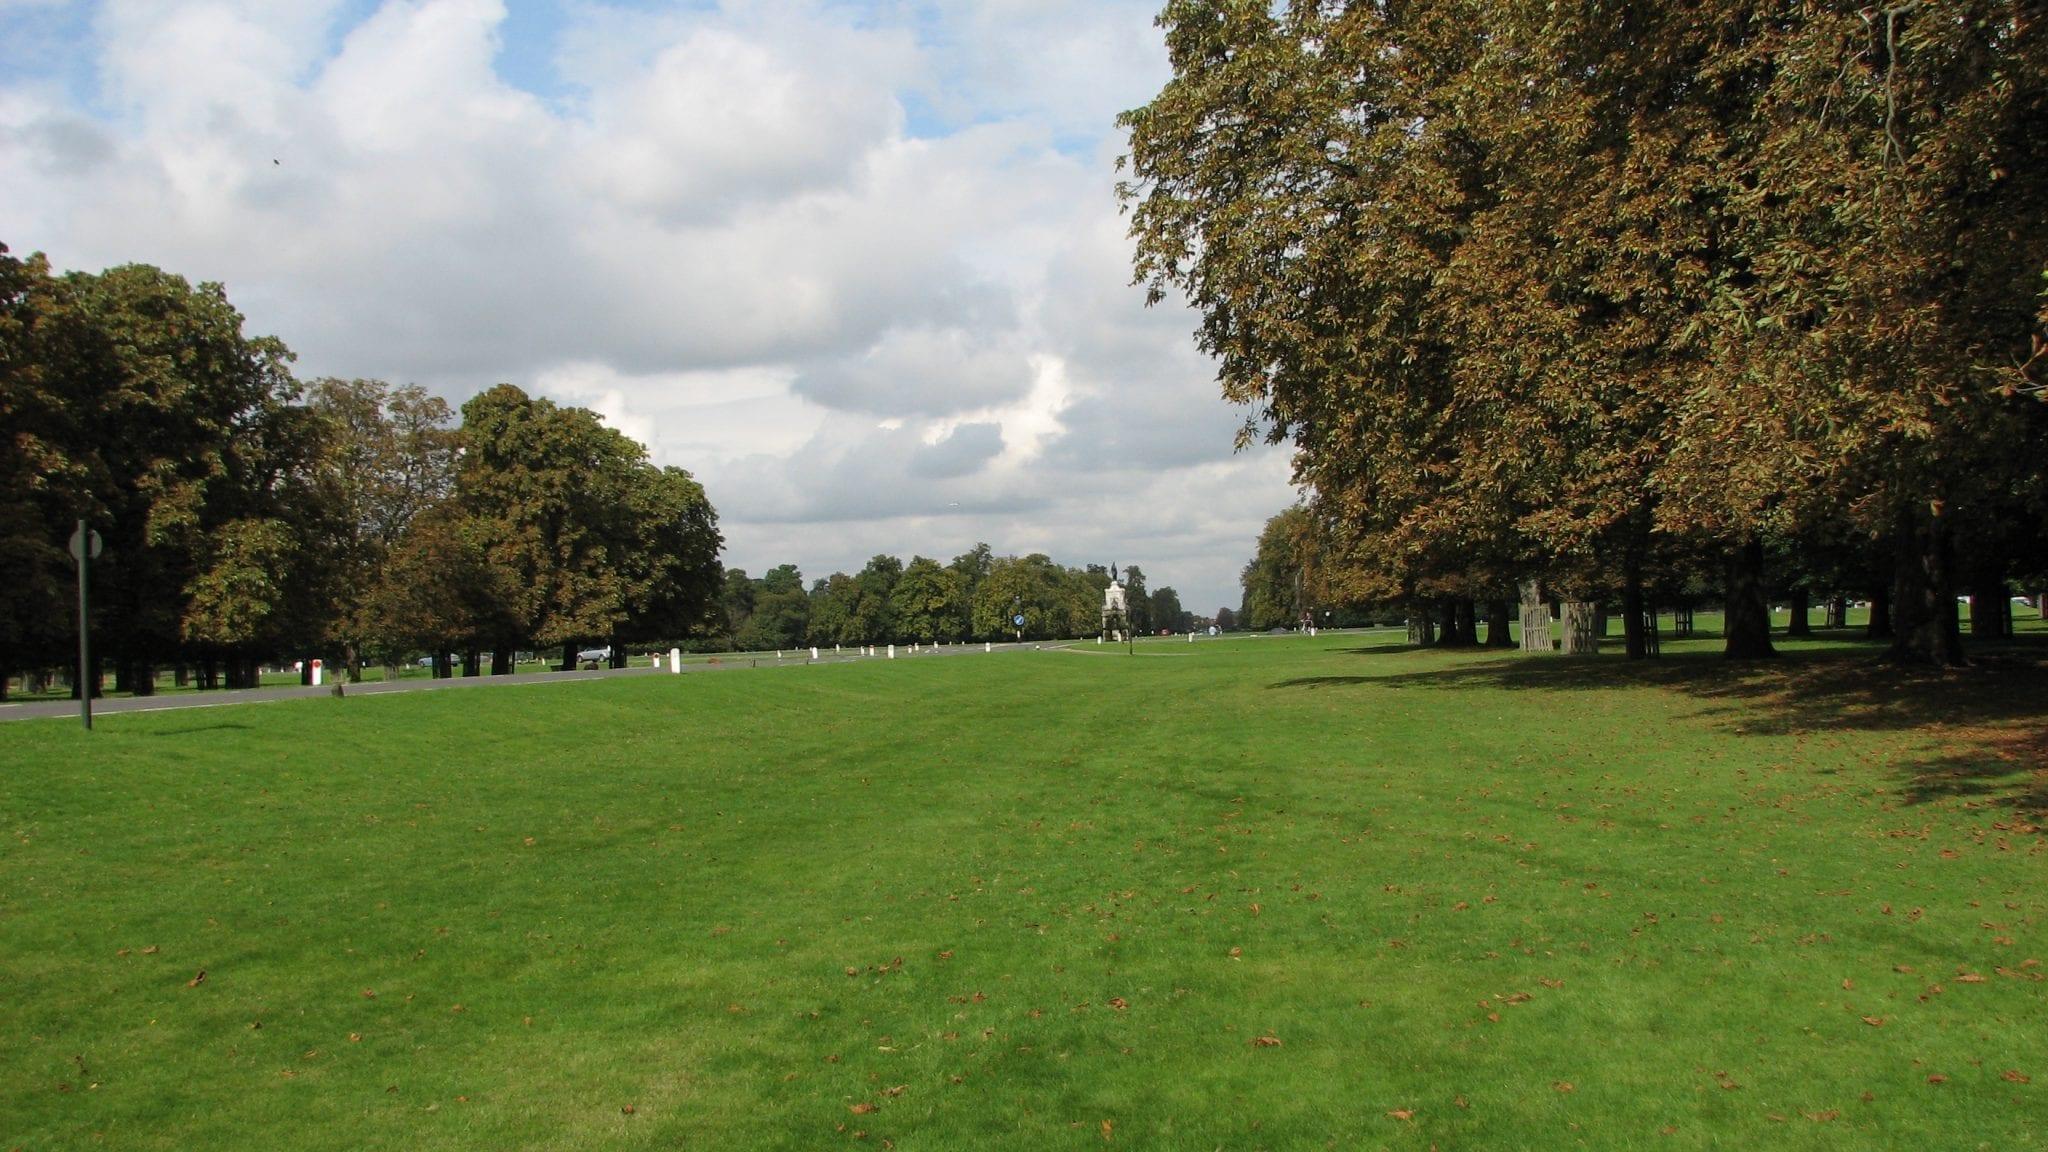 Zonas verdes como lugares de interés de Londres